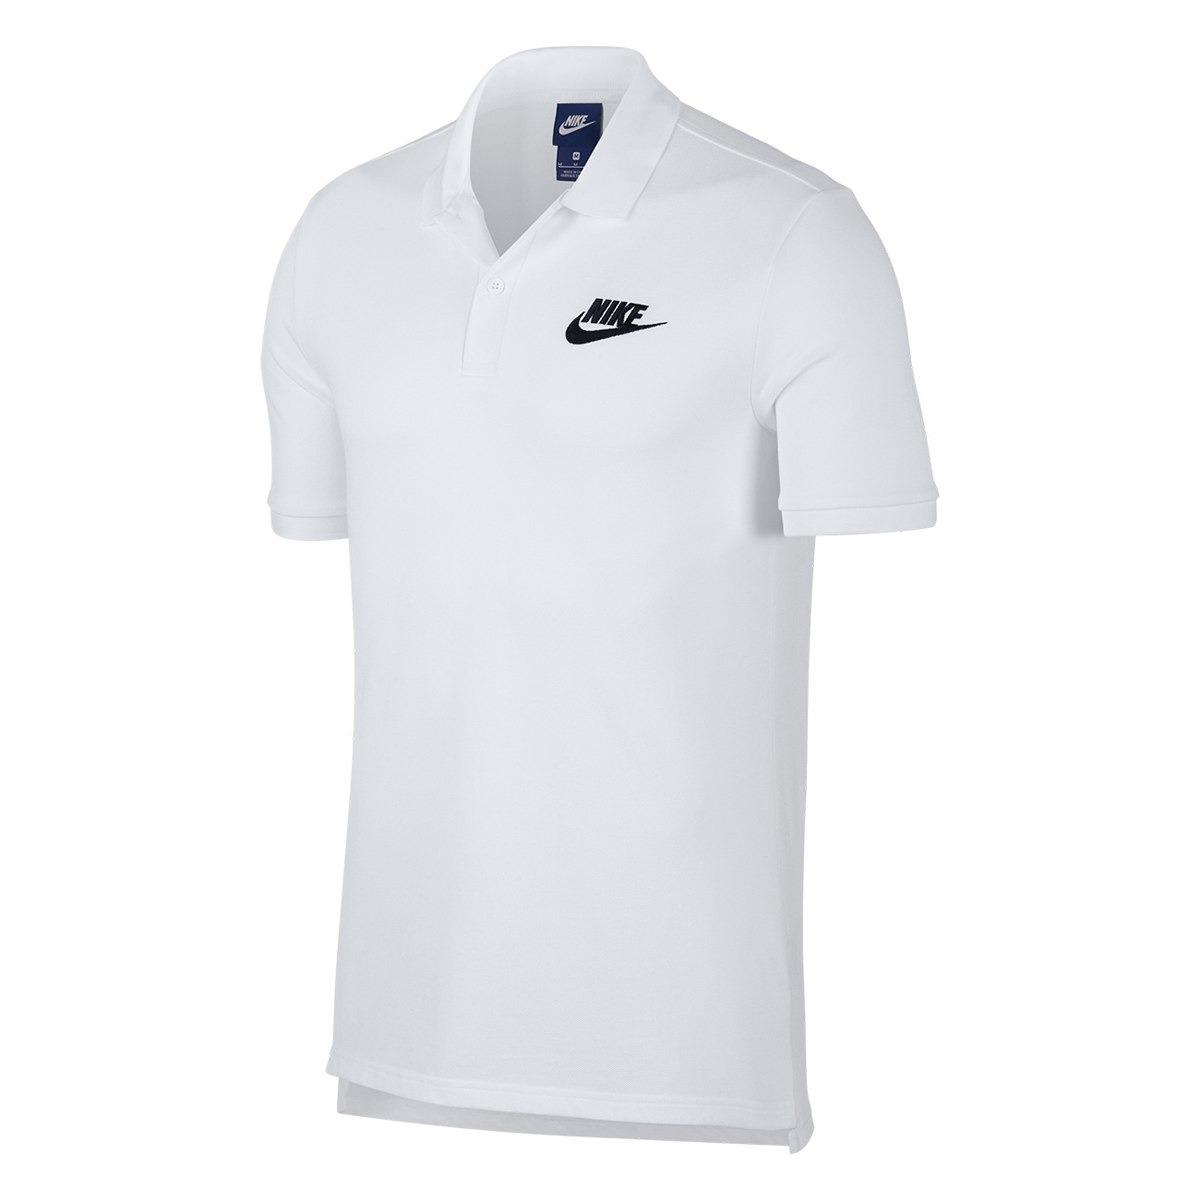 dcdfa3909 camisa polo nike original nsw matchup ss jsy masculina. Carregando zoom.